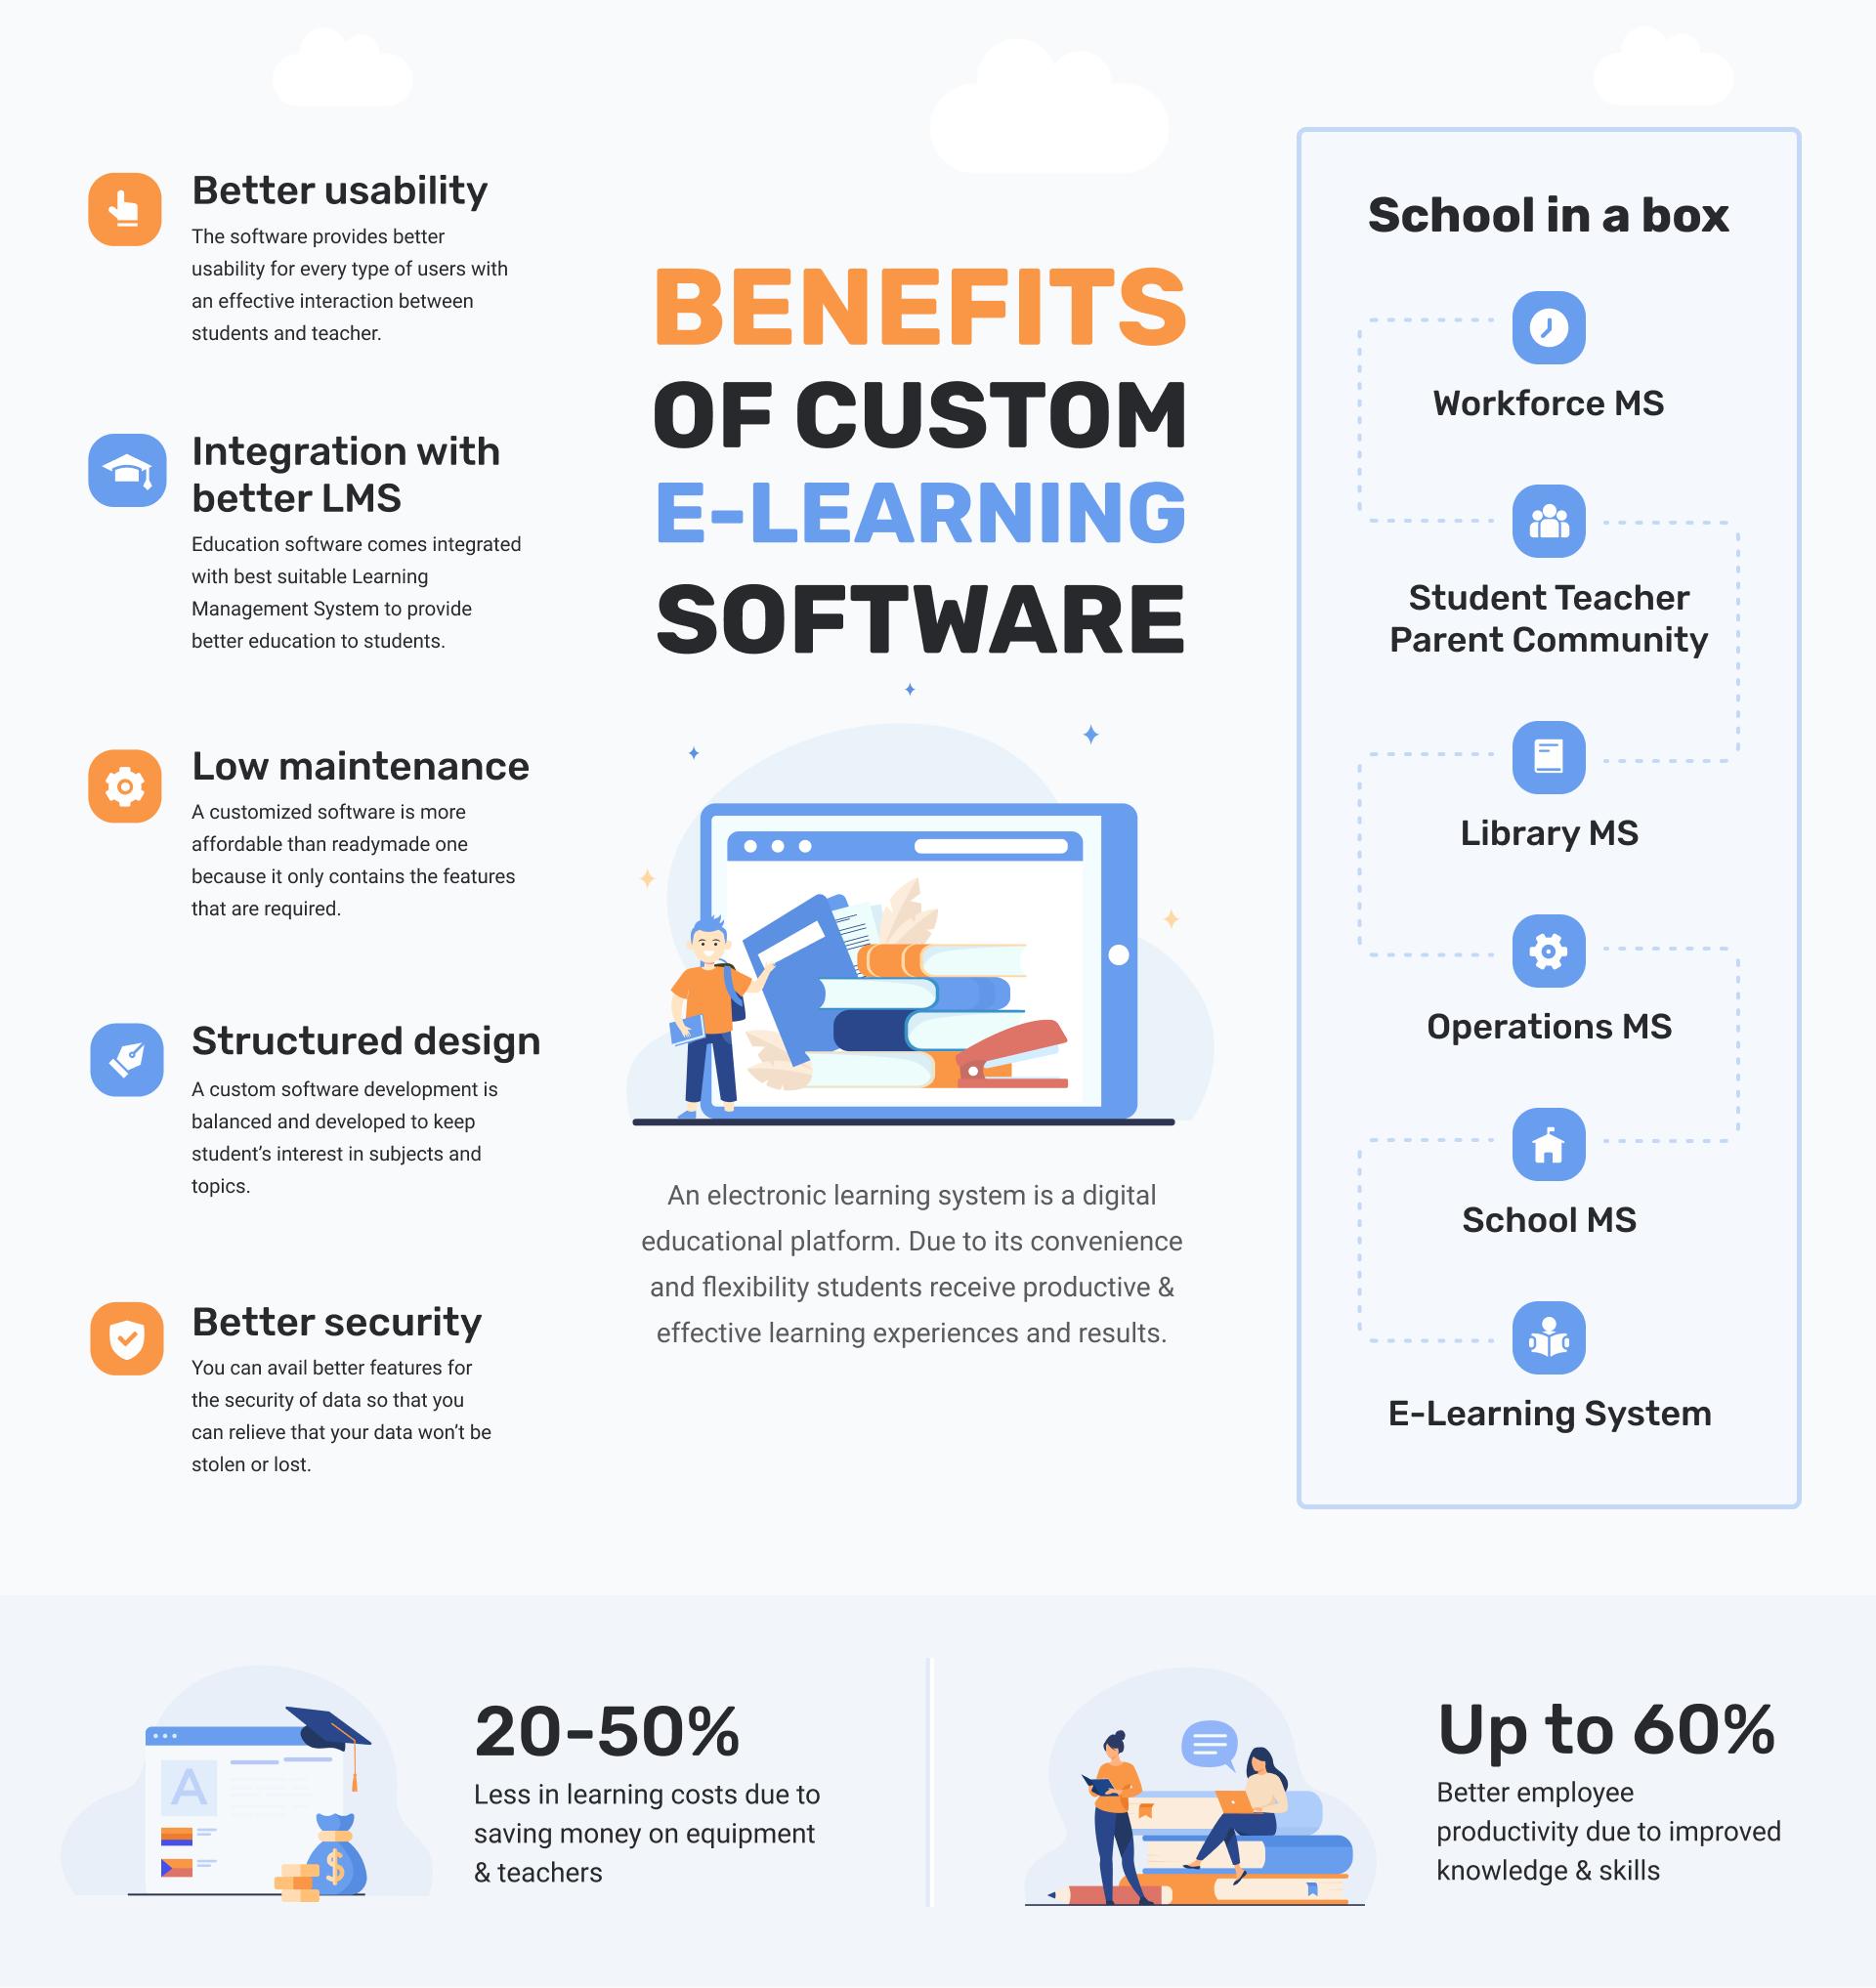 Benefits of custom elearning / education software development